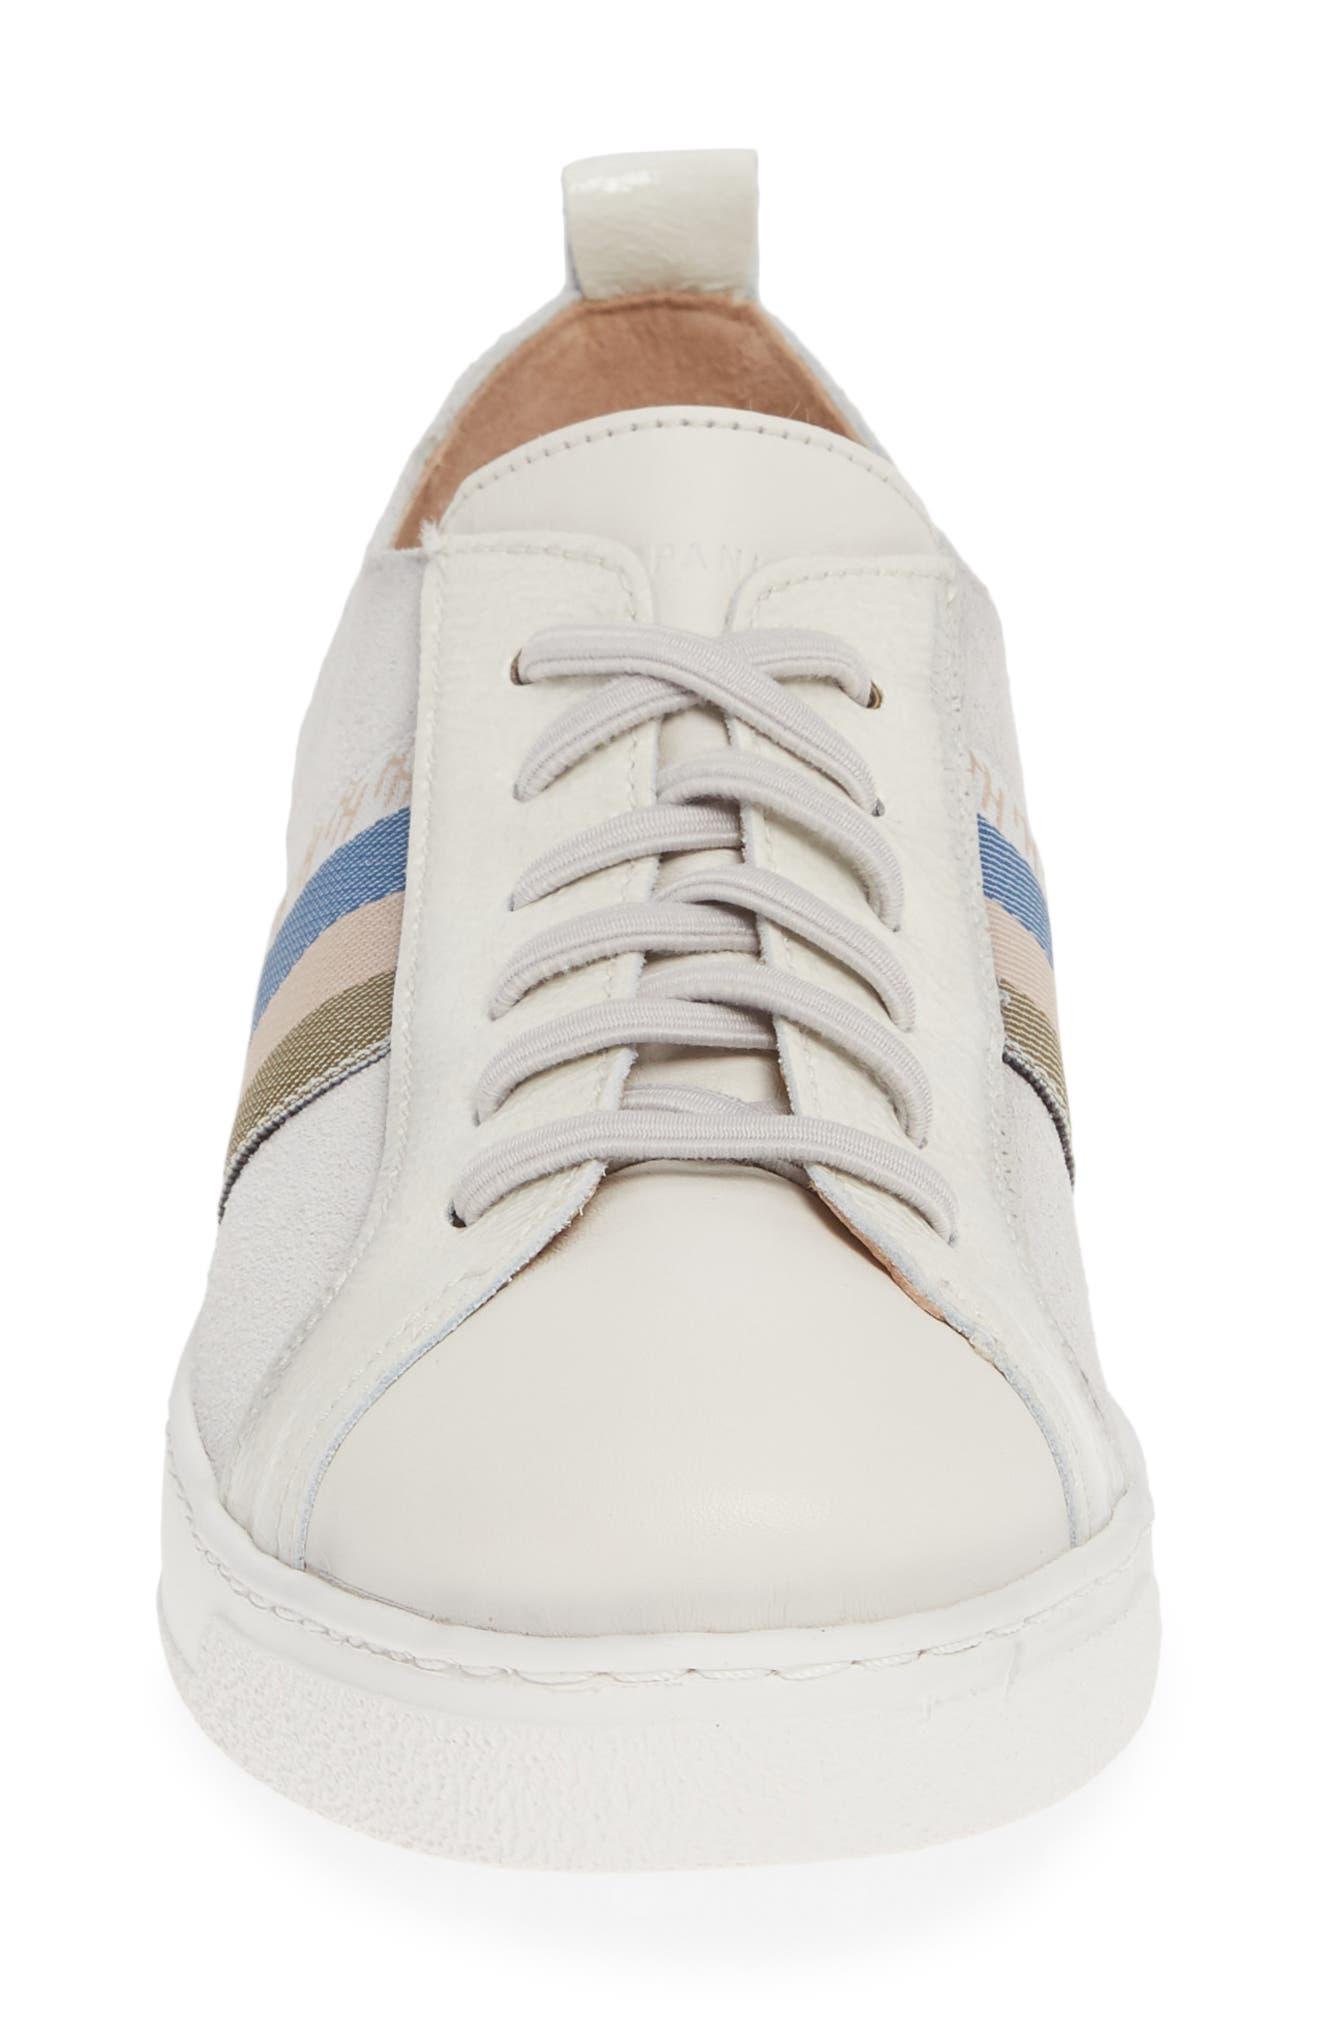 HISPANITAS, Kailua Platform Sneaker, Alternate thumbnail 4, color, VELOUR PANNA LEATHER